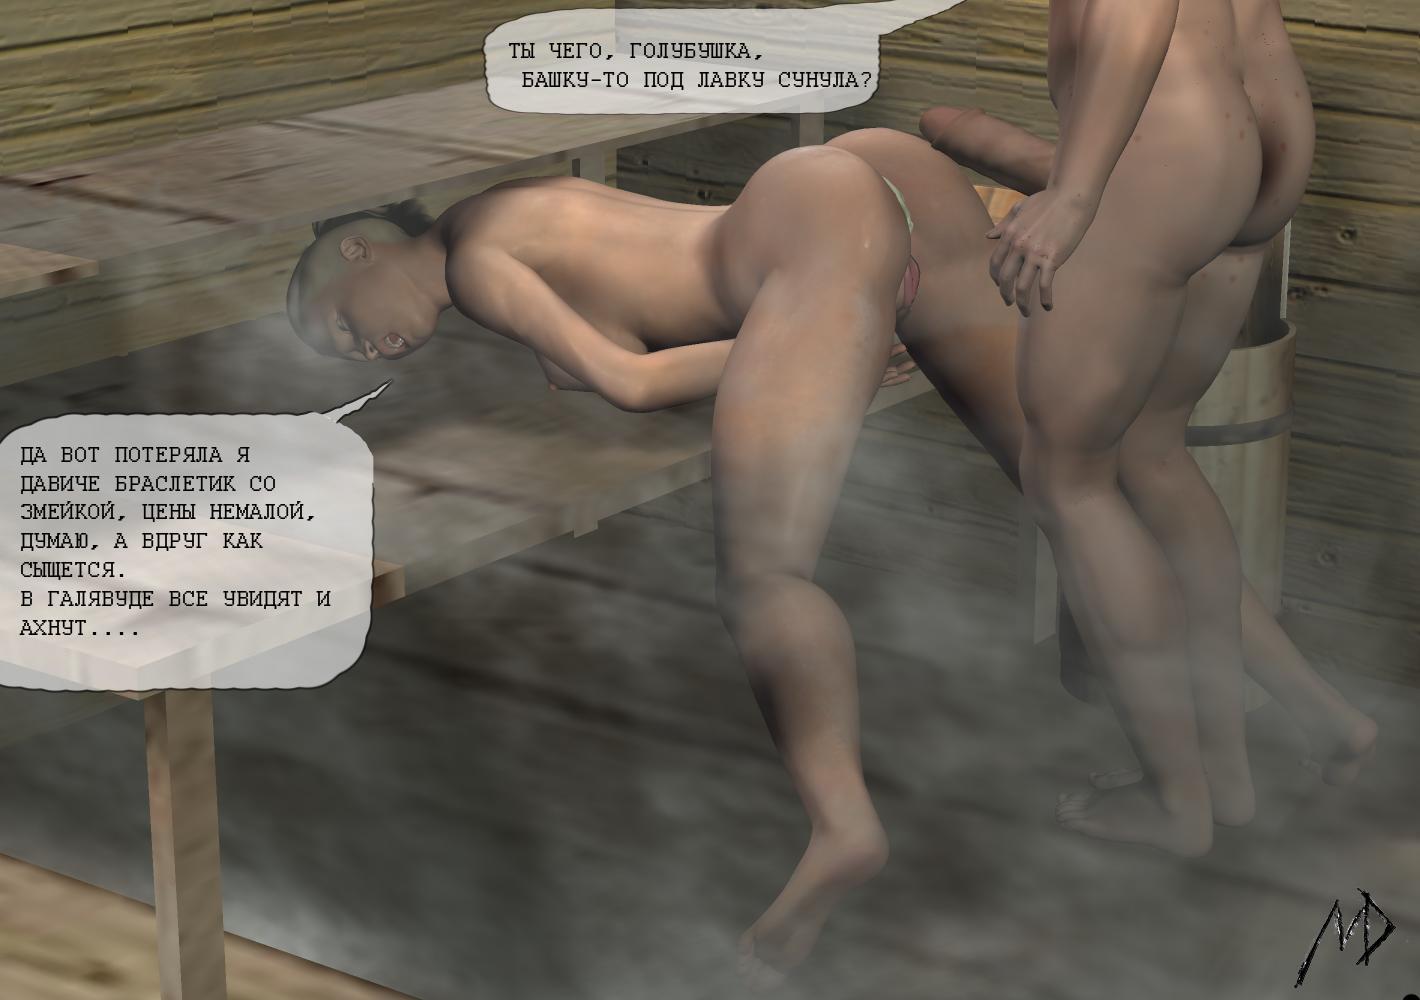 Про баню инцест порно истории